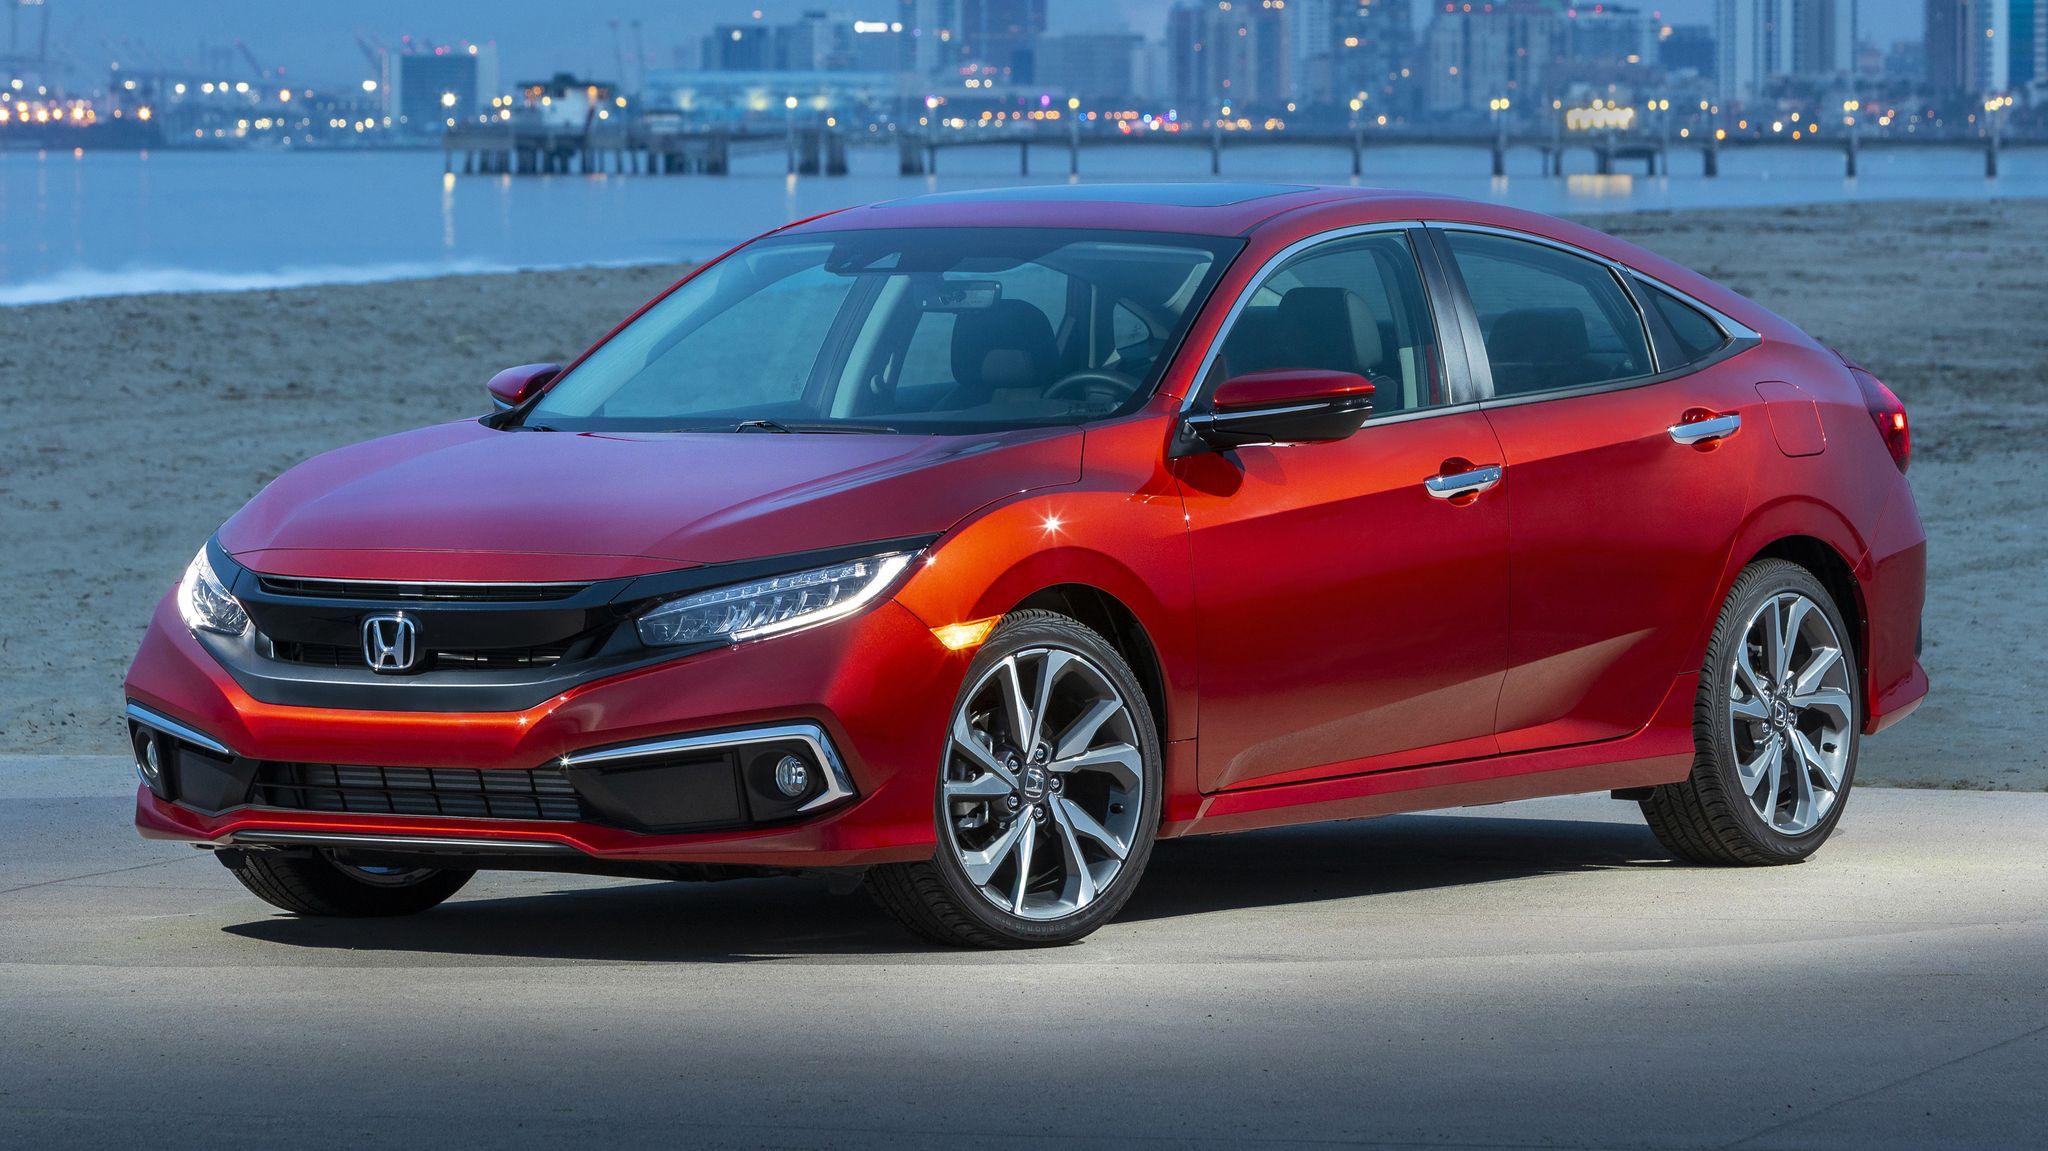 2021 Honda Civic Coupe Price